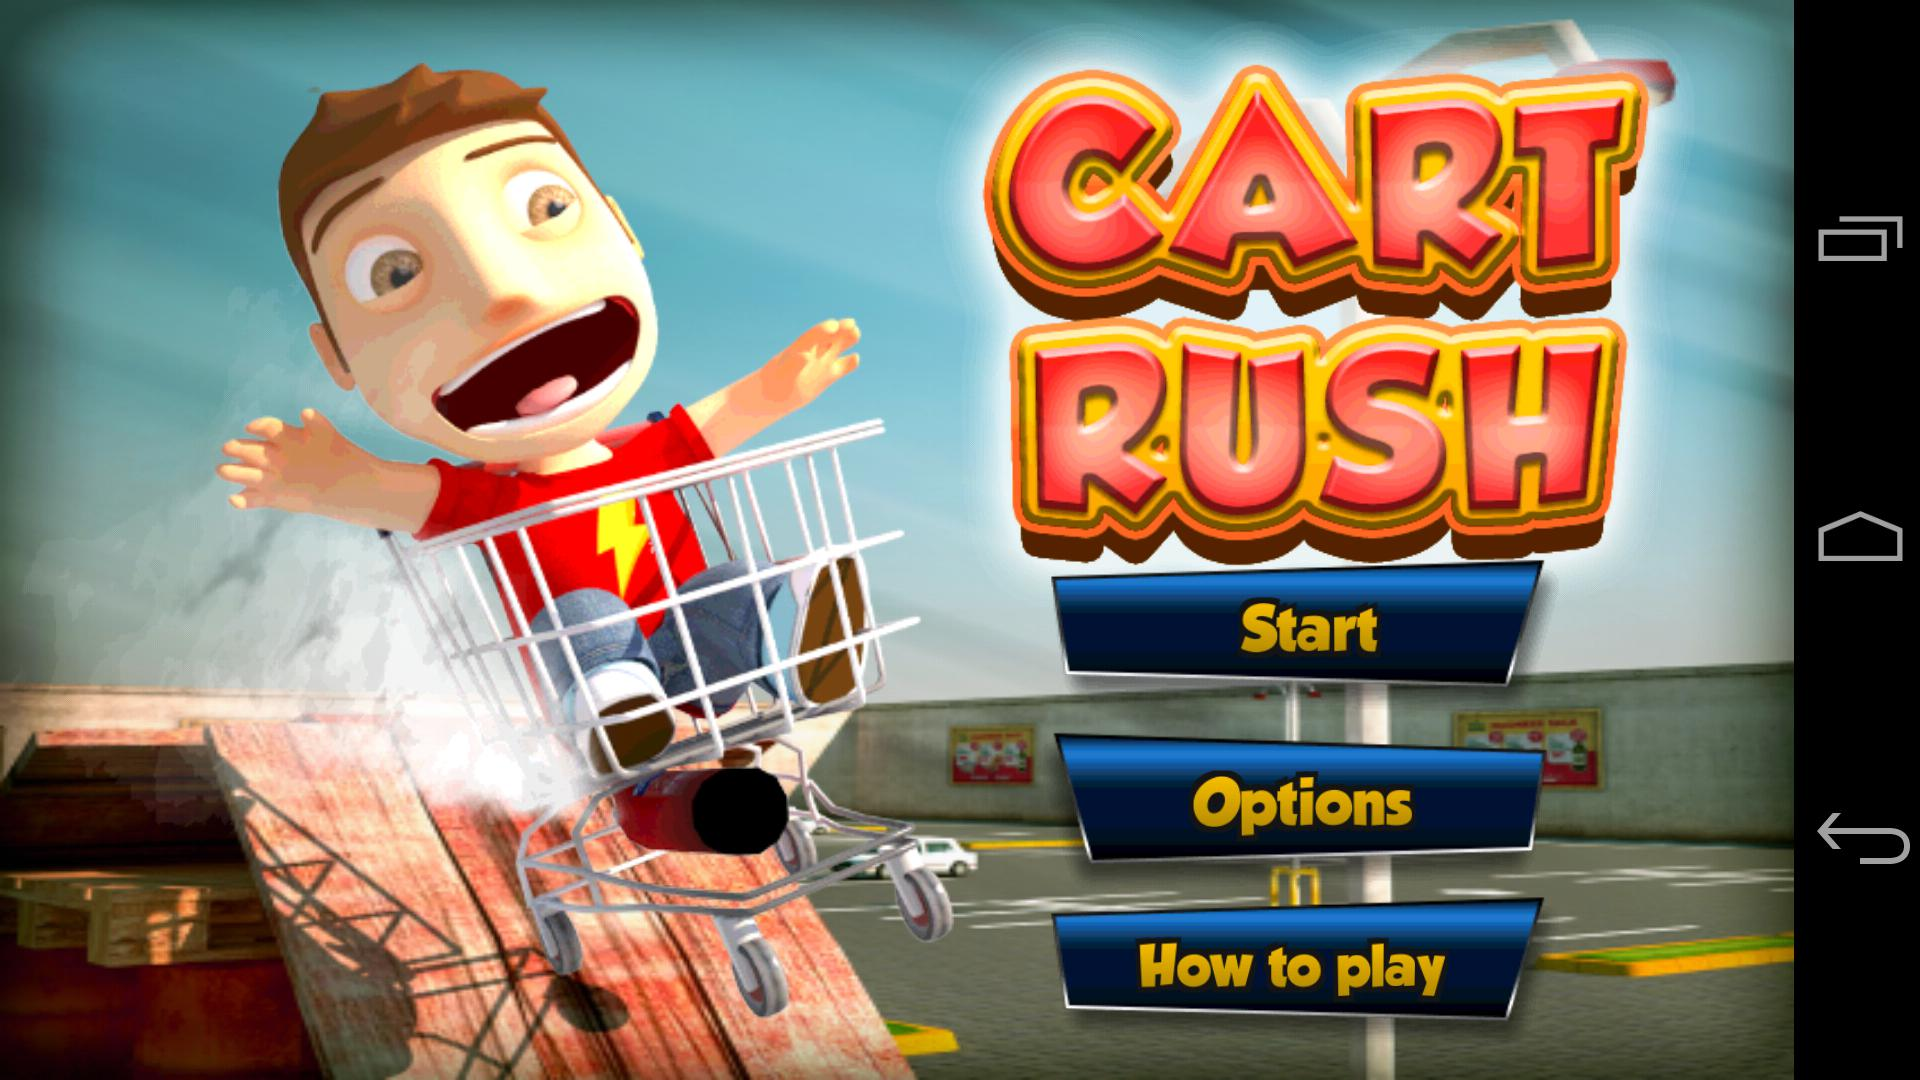 Cart Rush 游戏截图1